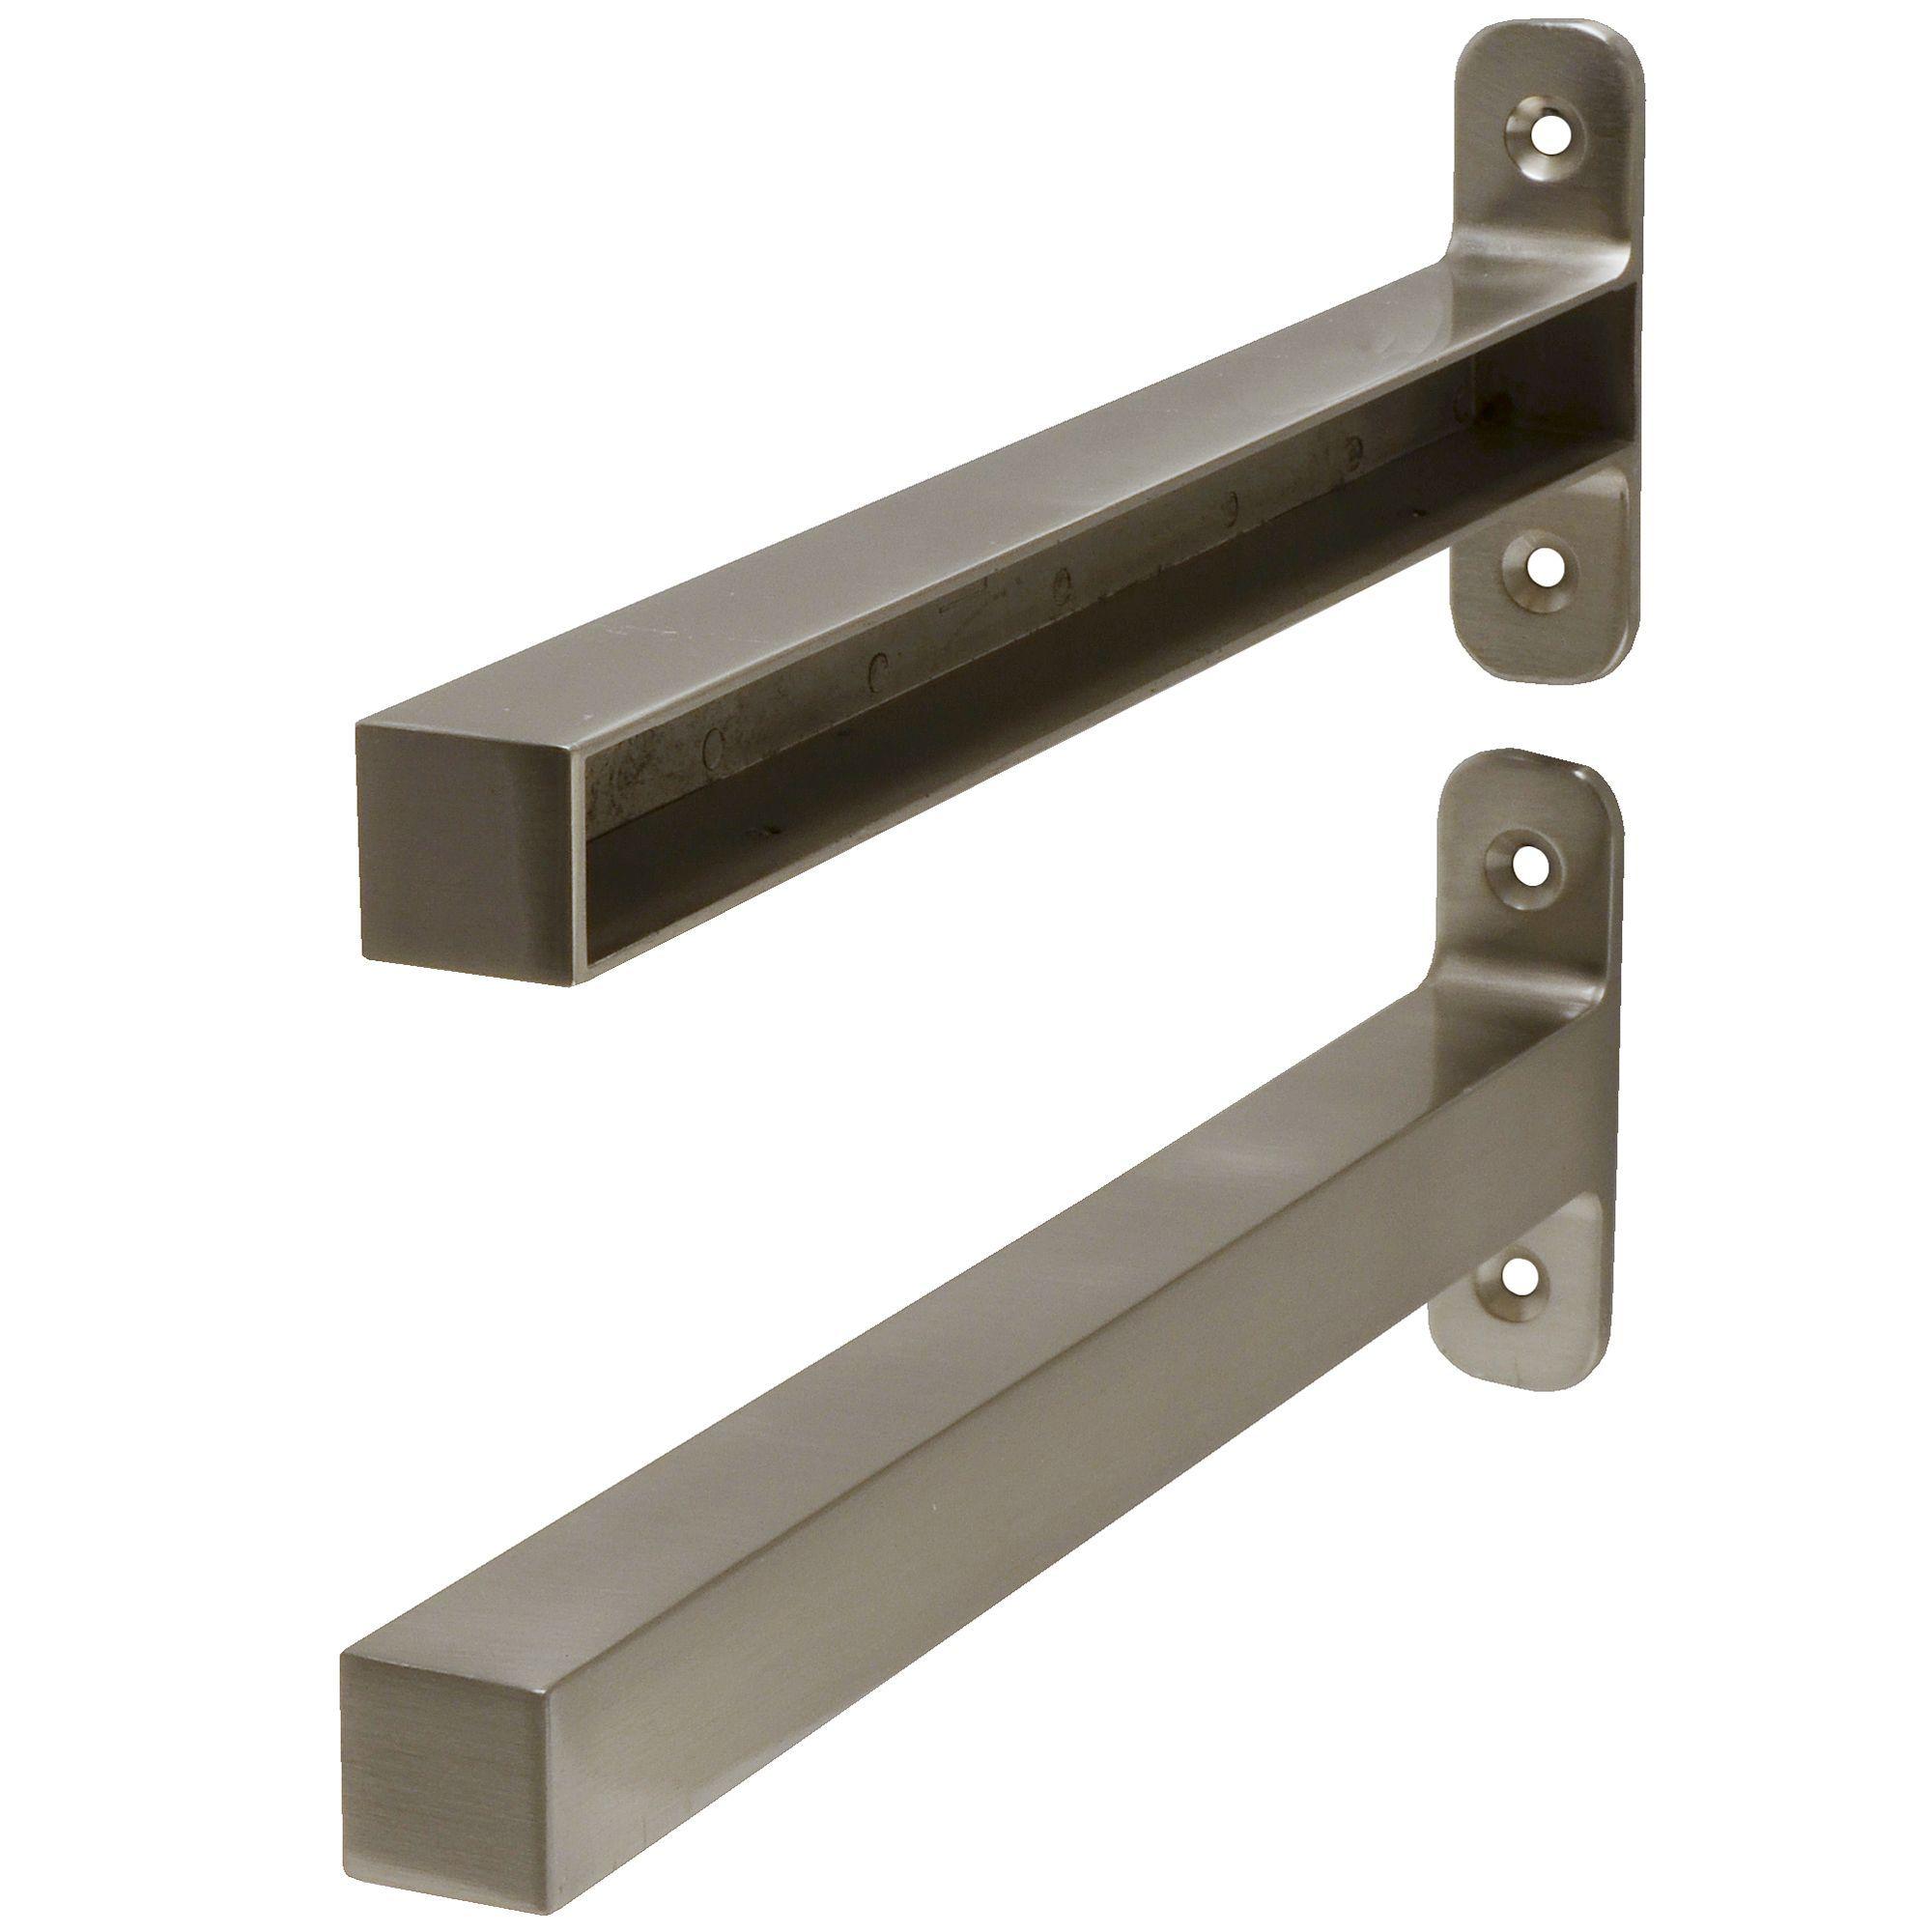 Form Brushed Aluminium Shelf Brackets D 295mm Rooms Diy At B Q Shelf End Brackets Steel Shelf Brackets Shelf Brackets